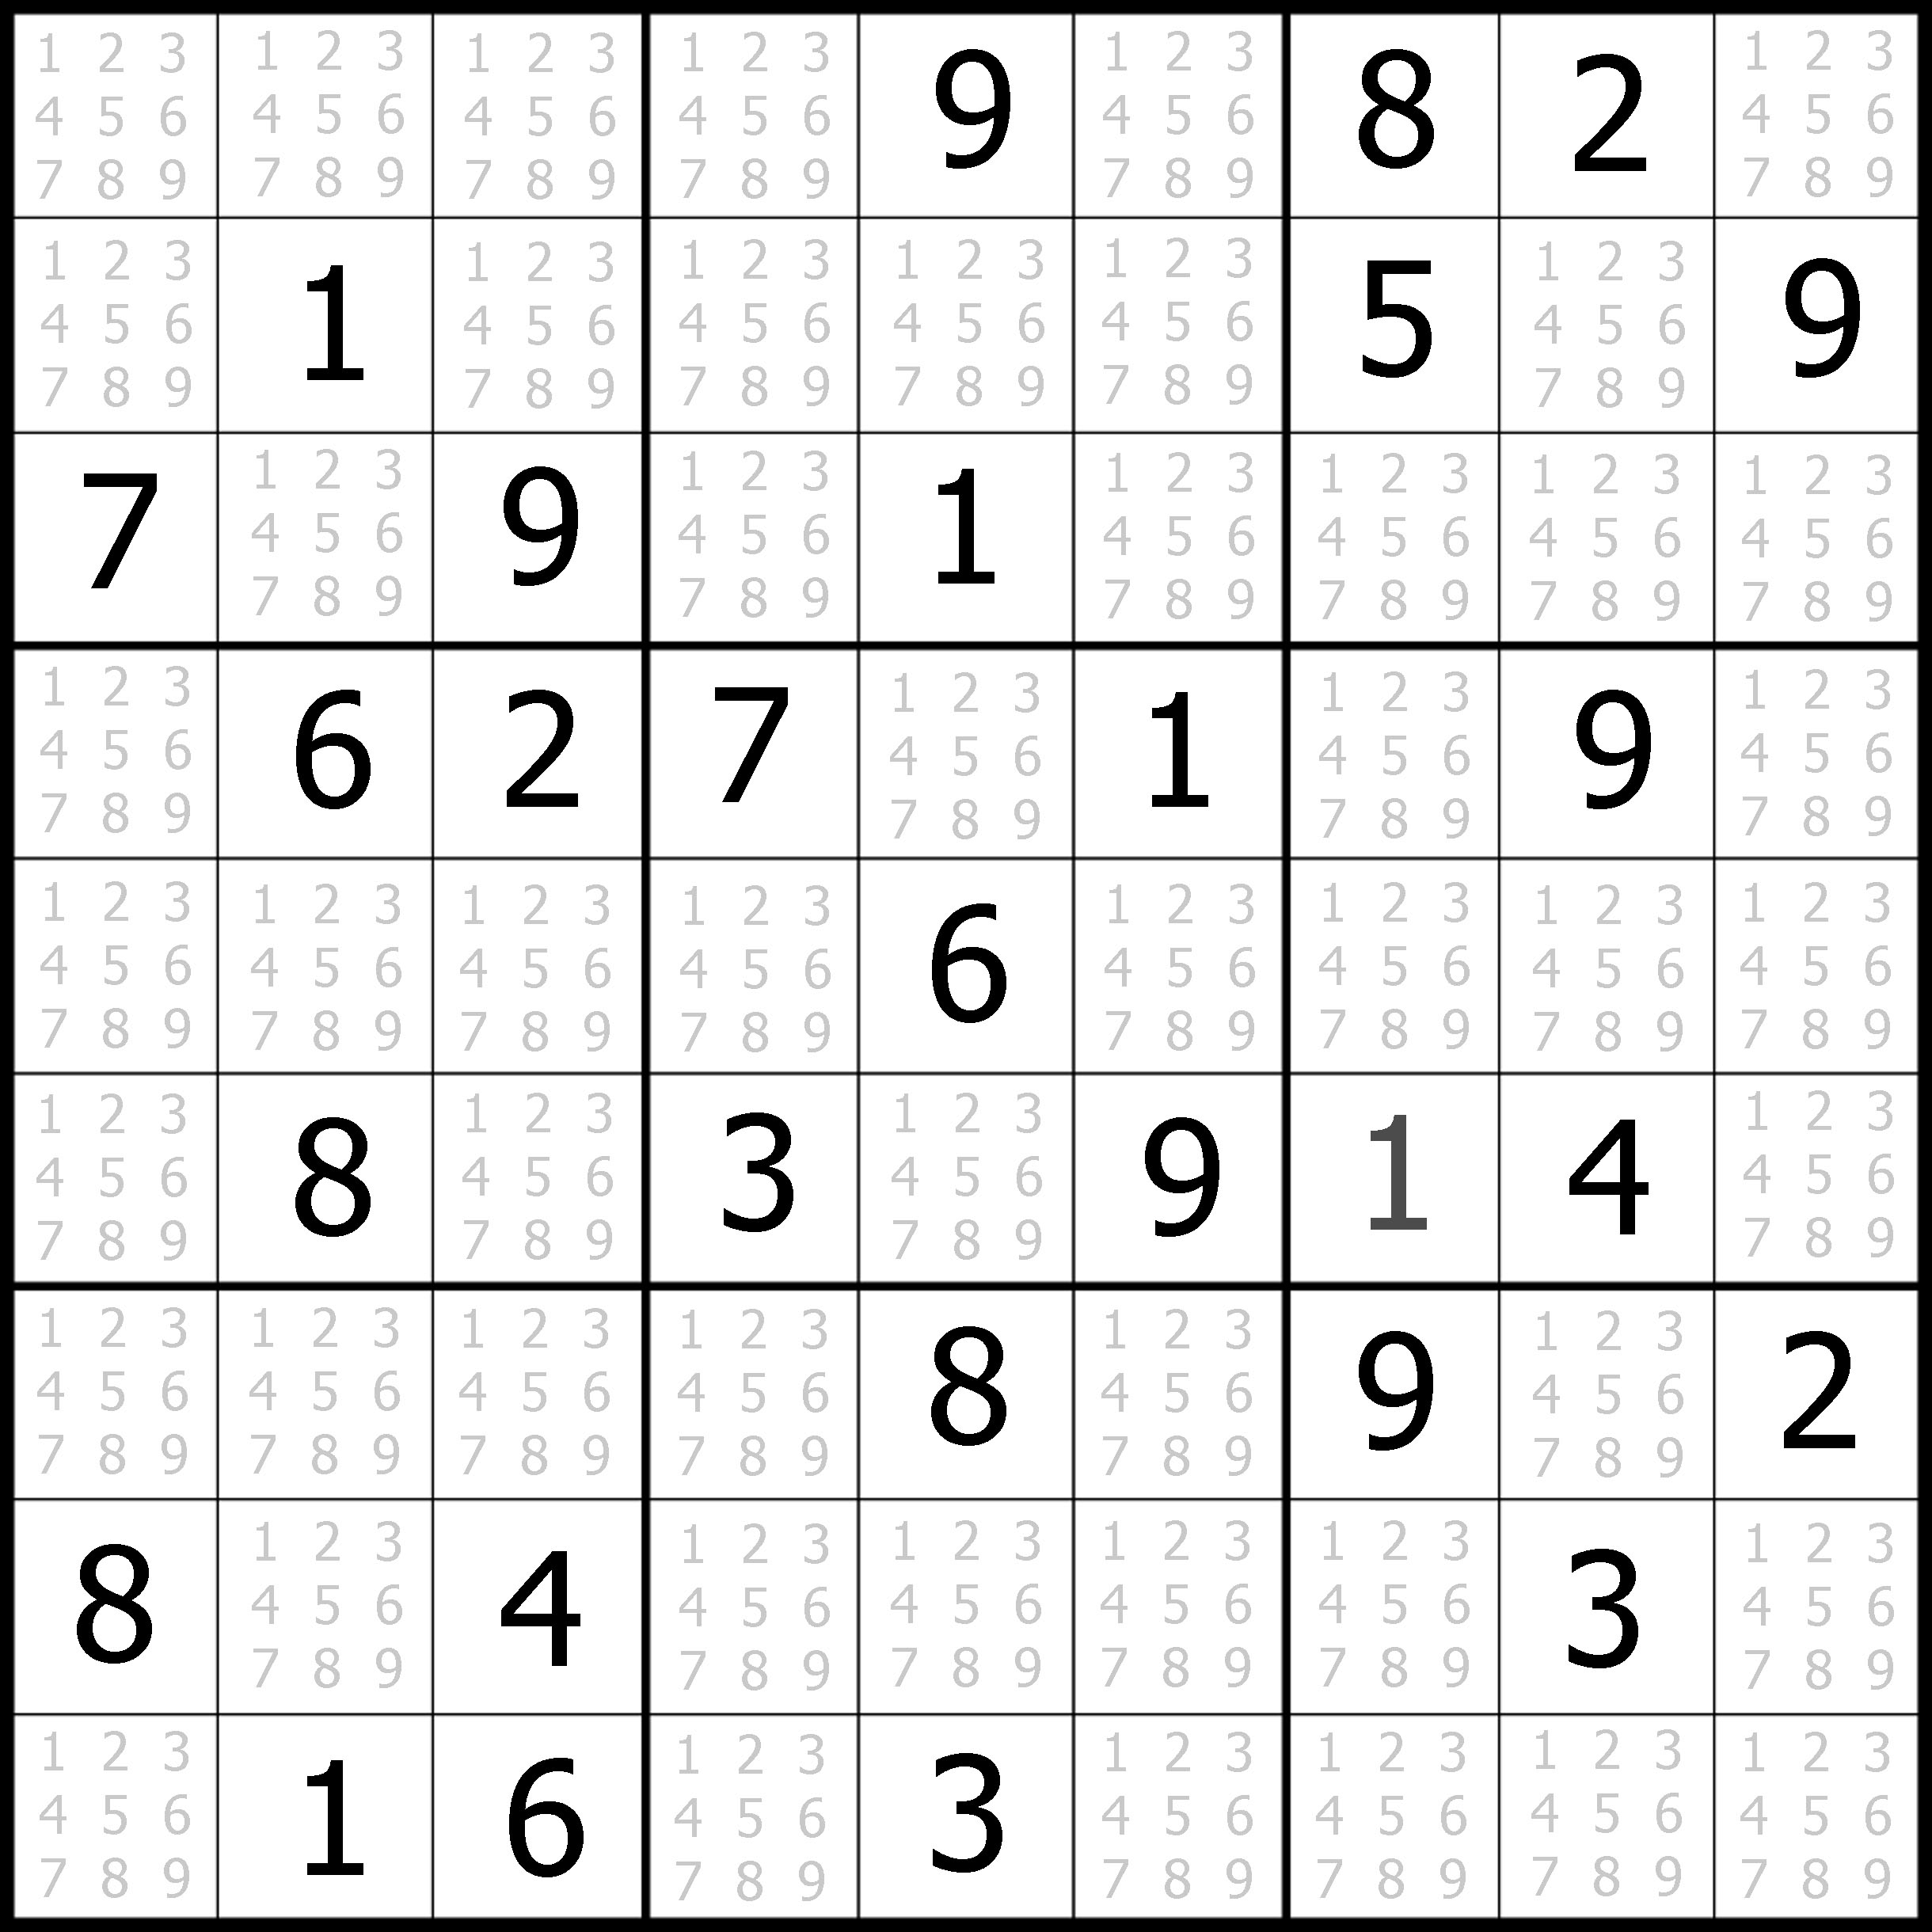 Easy Sudoku Printable | Kids Activities - Printable Sudoku Puzzles Online